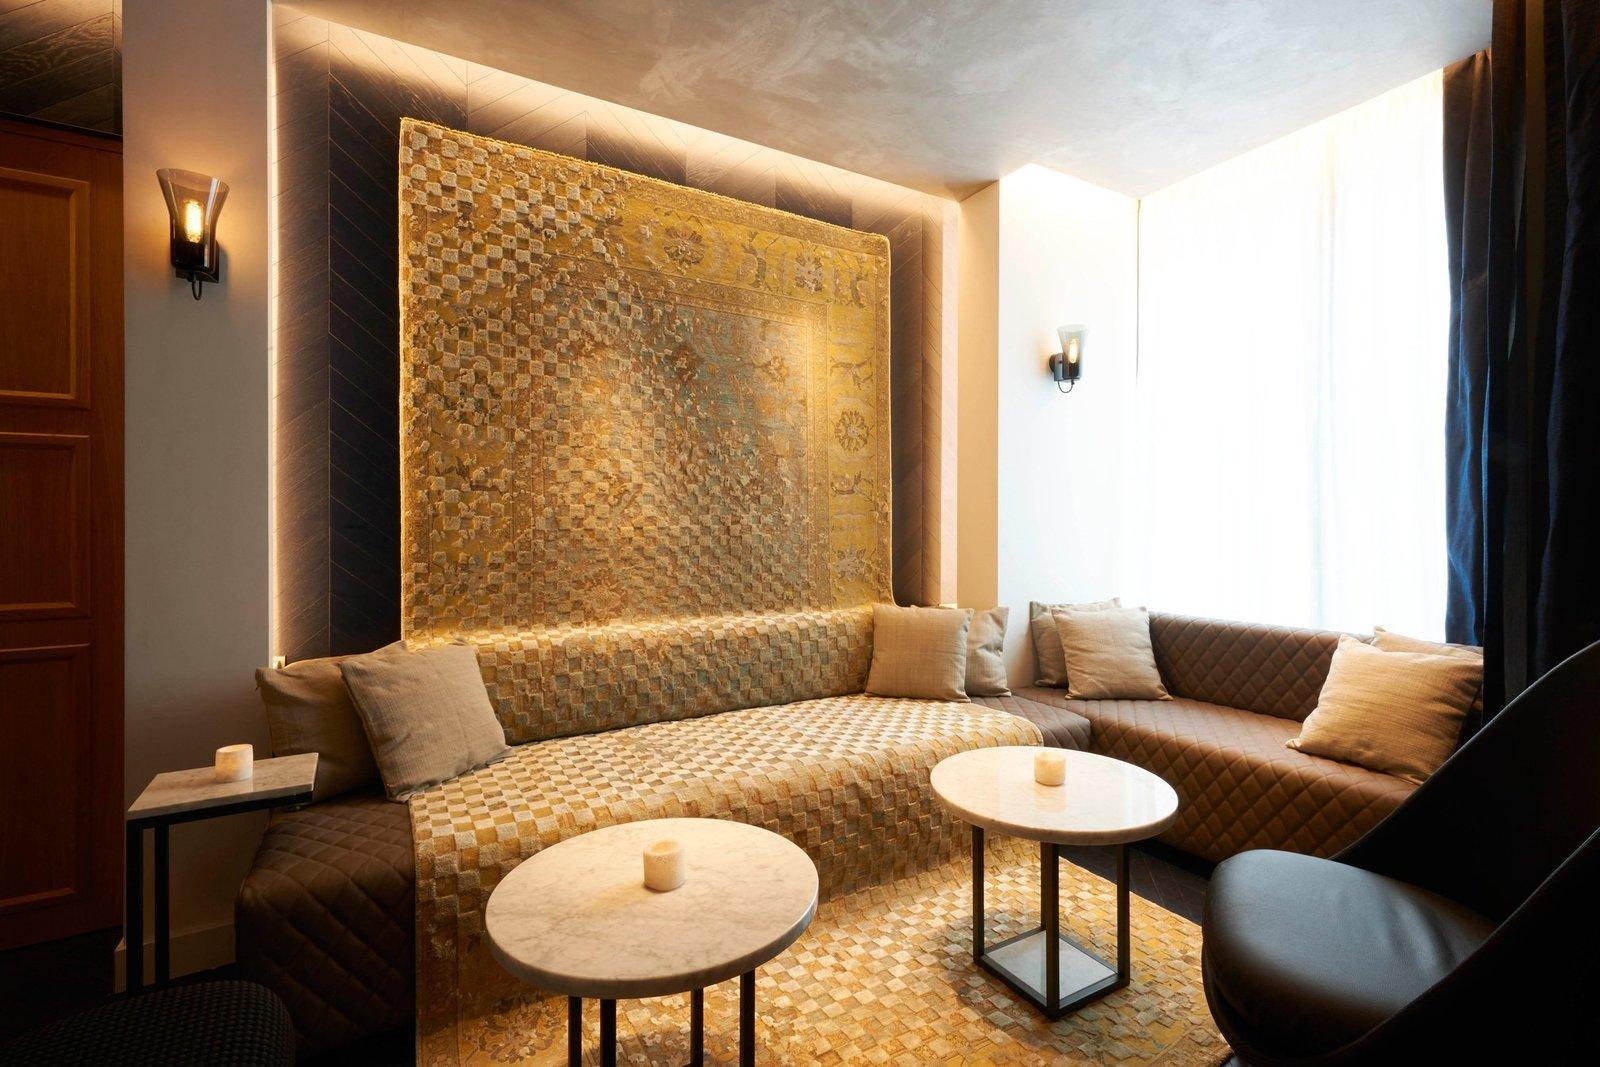 Living Room, Sofa, Coffee Tables, and Wall Lighting  Amastan Paris